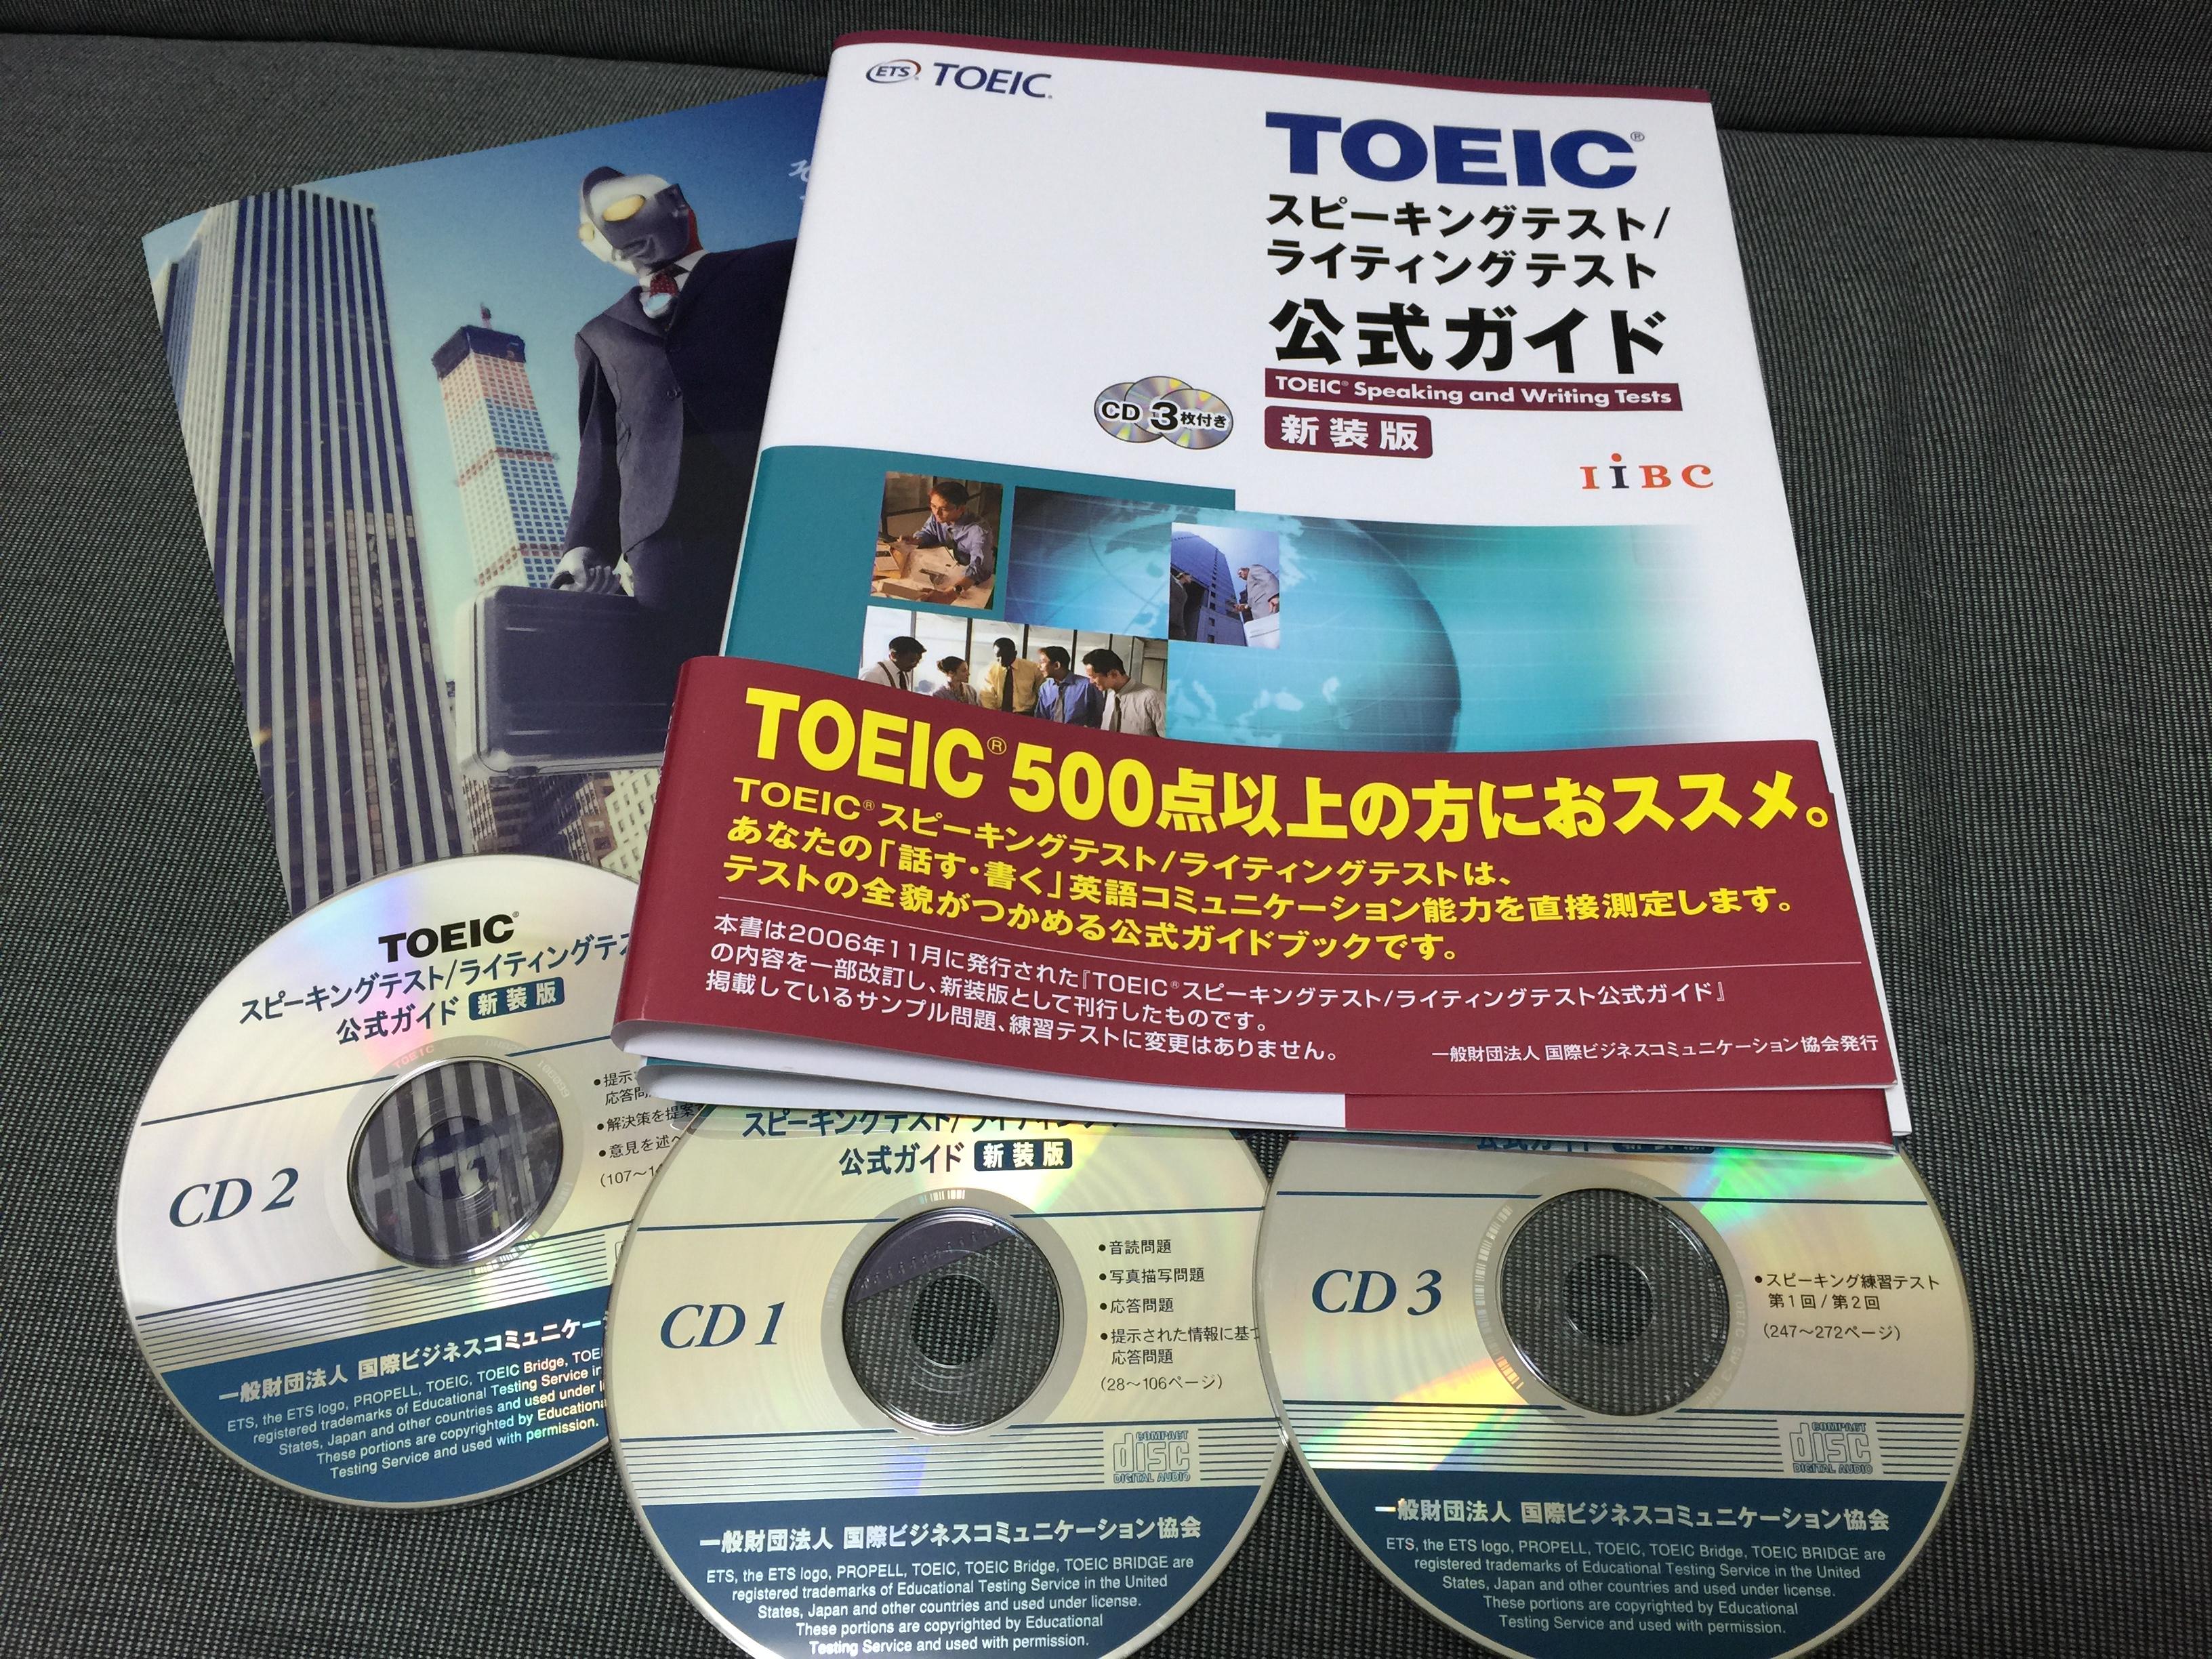 「TOEIC(R) スピーキングテスト/ライティングテスト公式ガイド 新装版」の感想・レビュー①